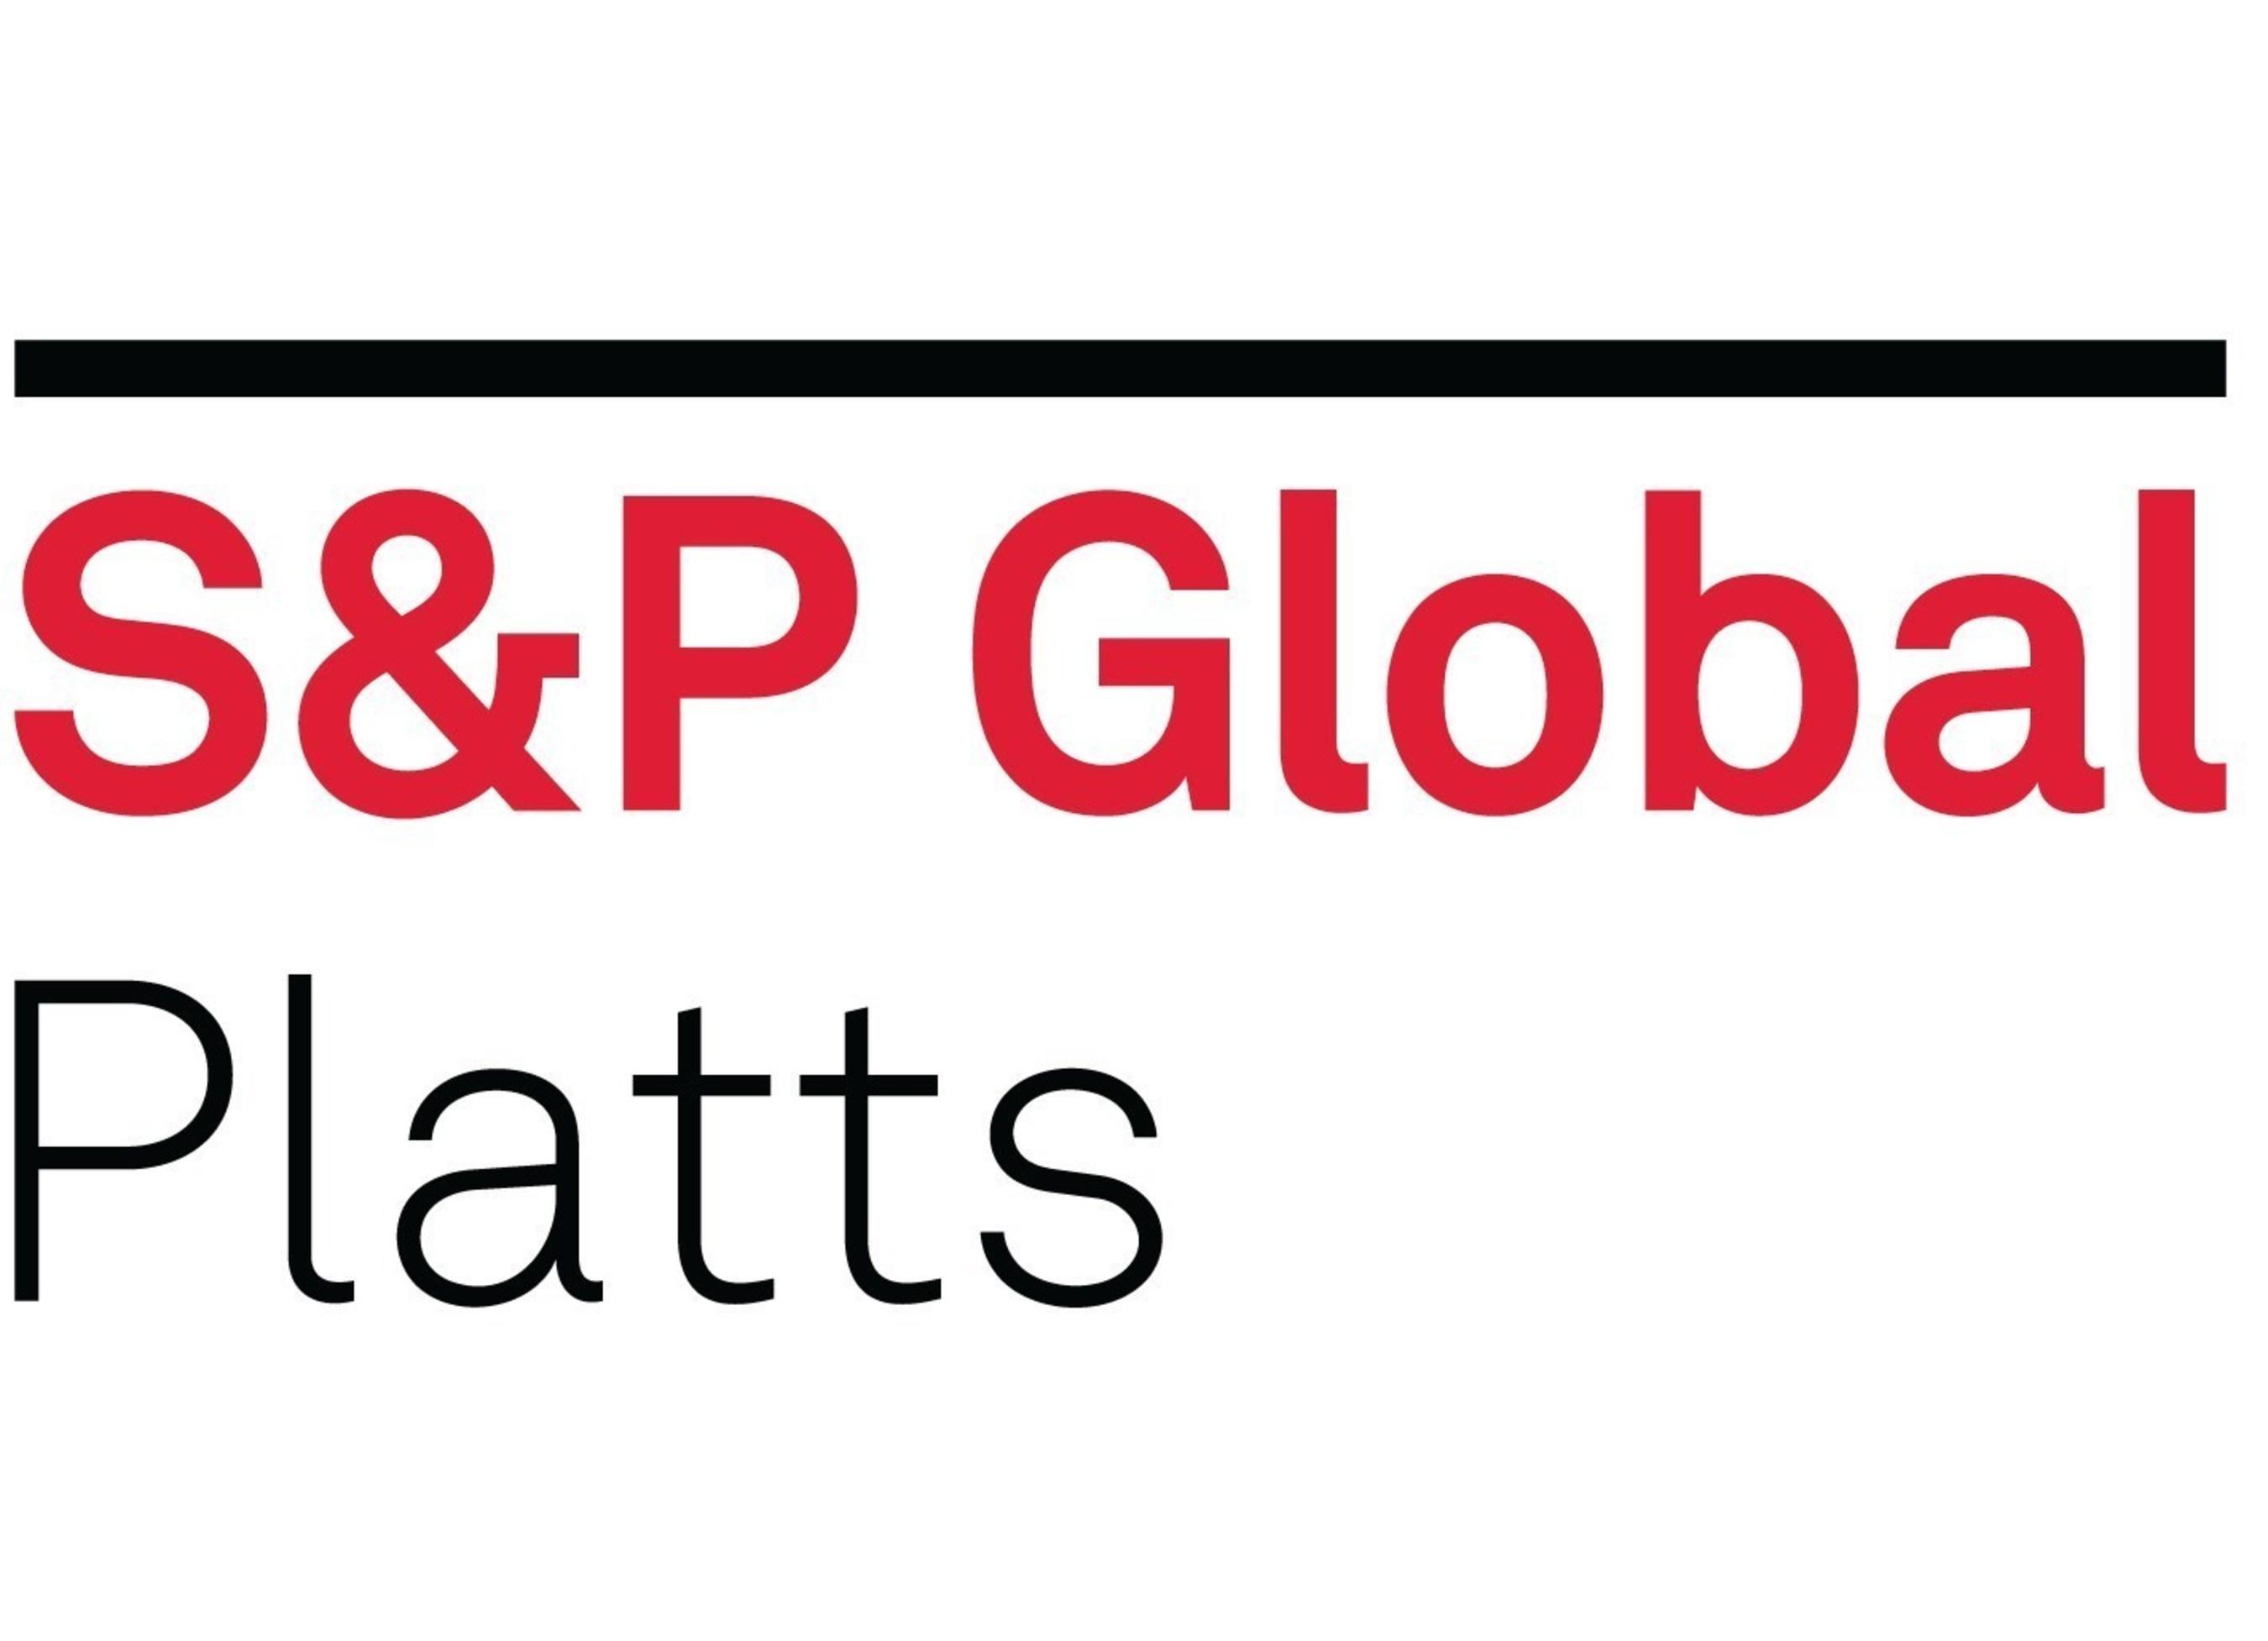 SampP Global Platts Acquires PIRA Energy Group